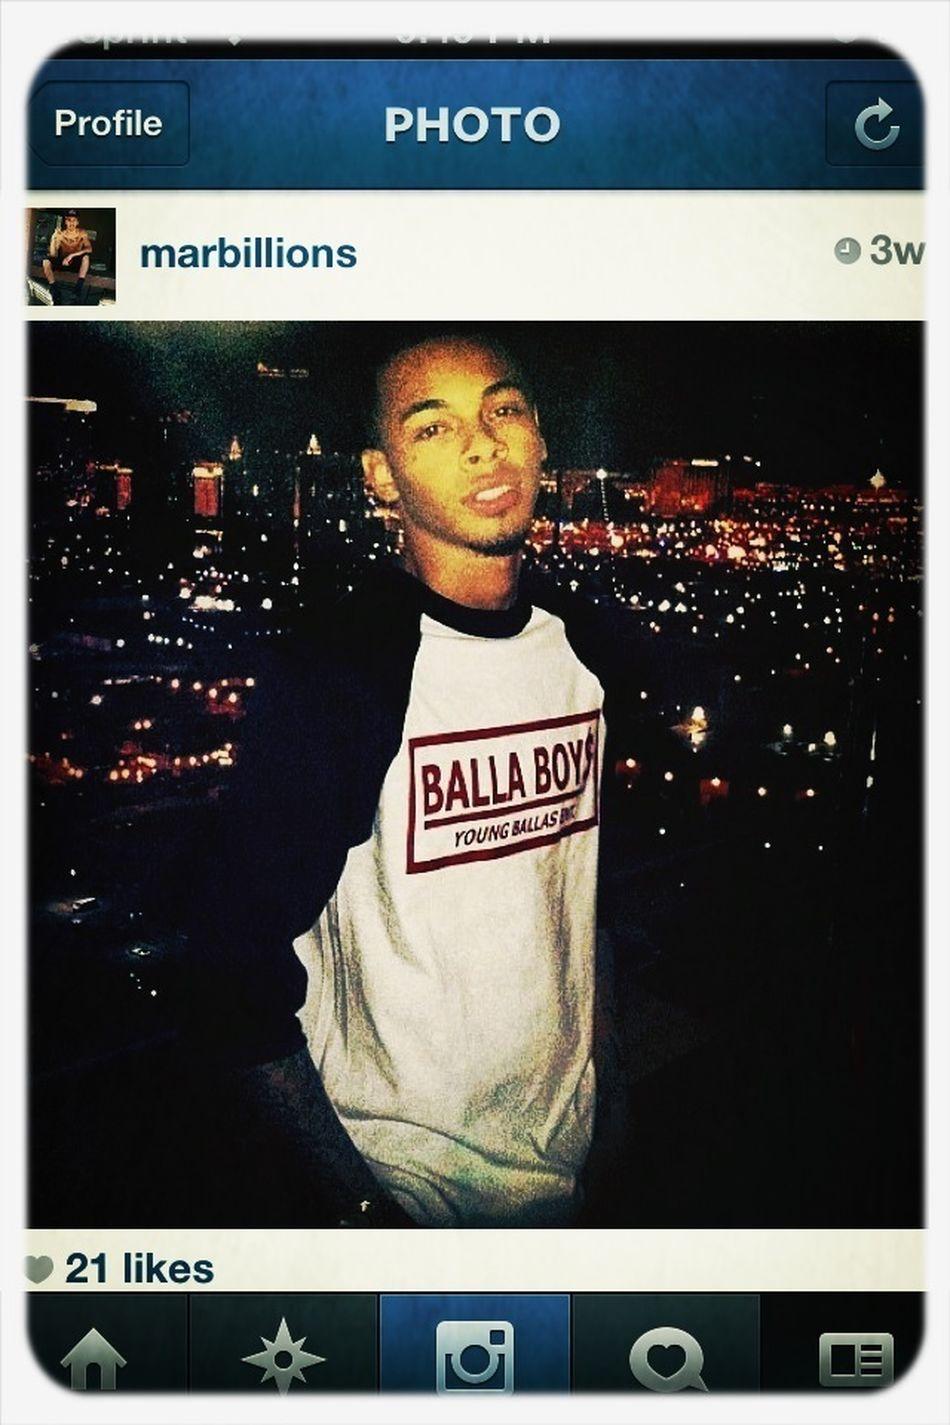 Marbillions